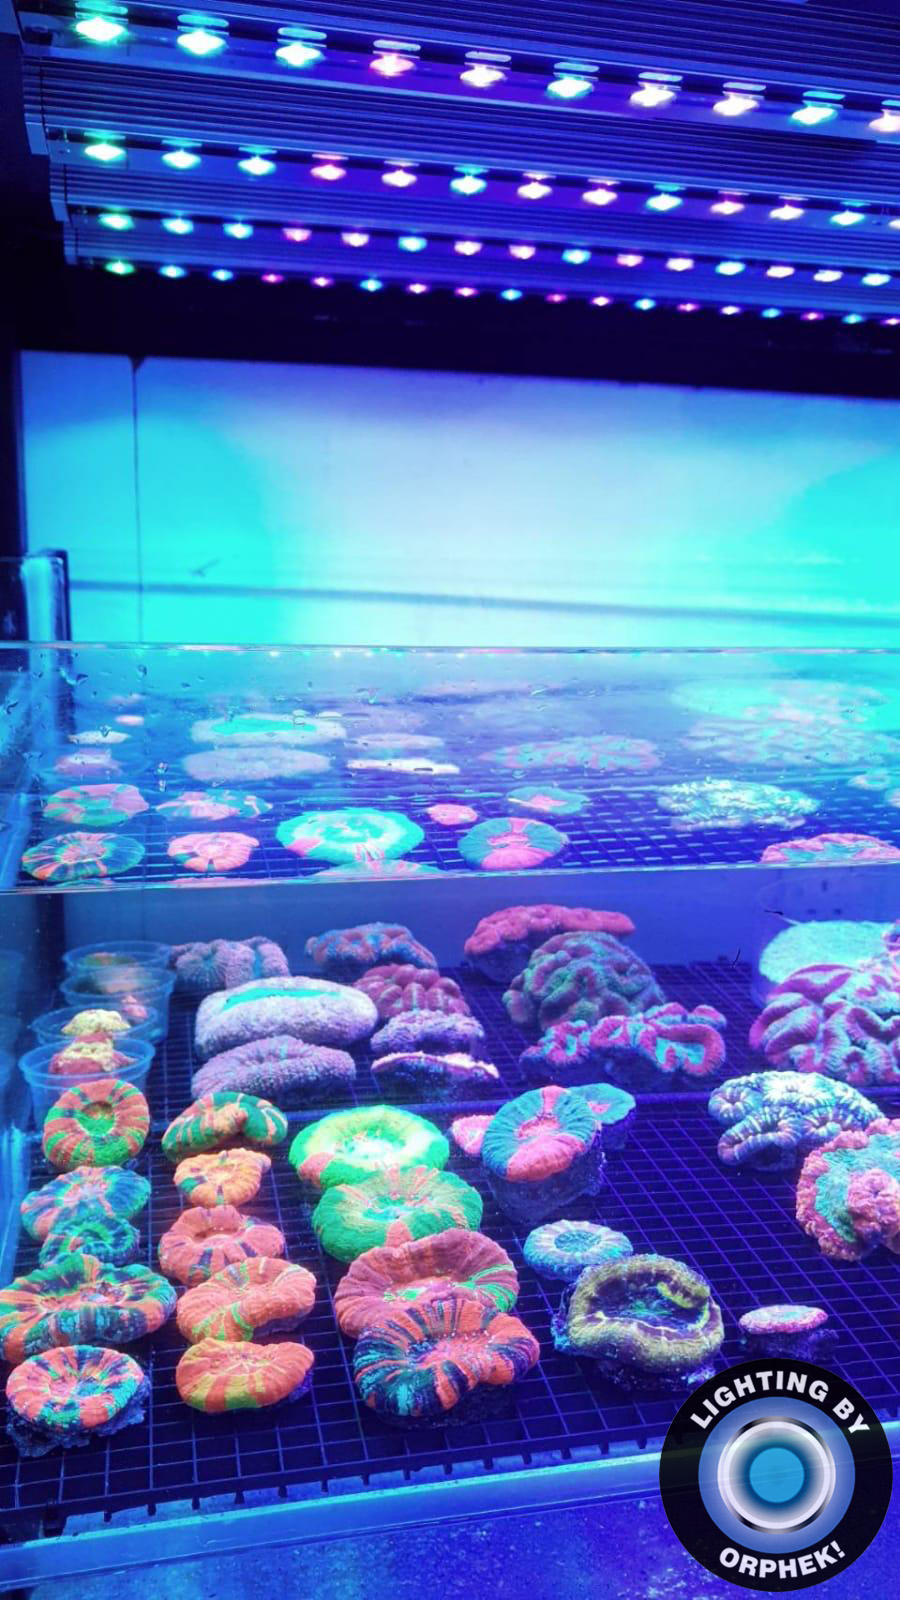 snelste coral pop LED strip 2020